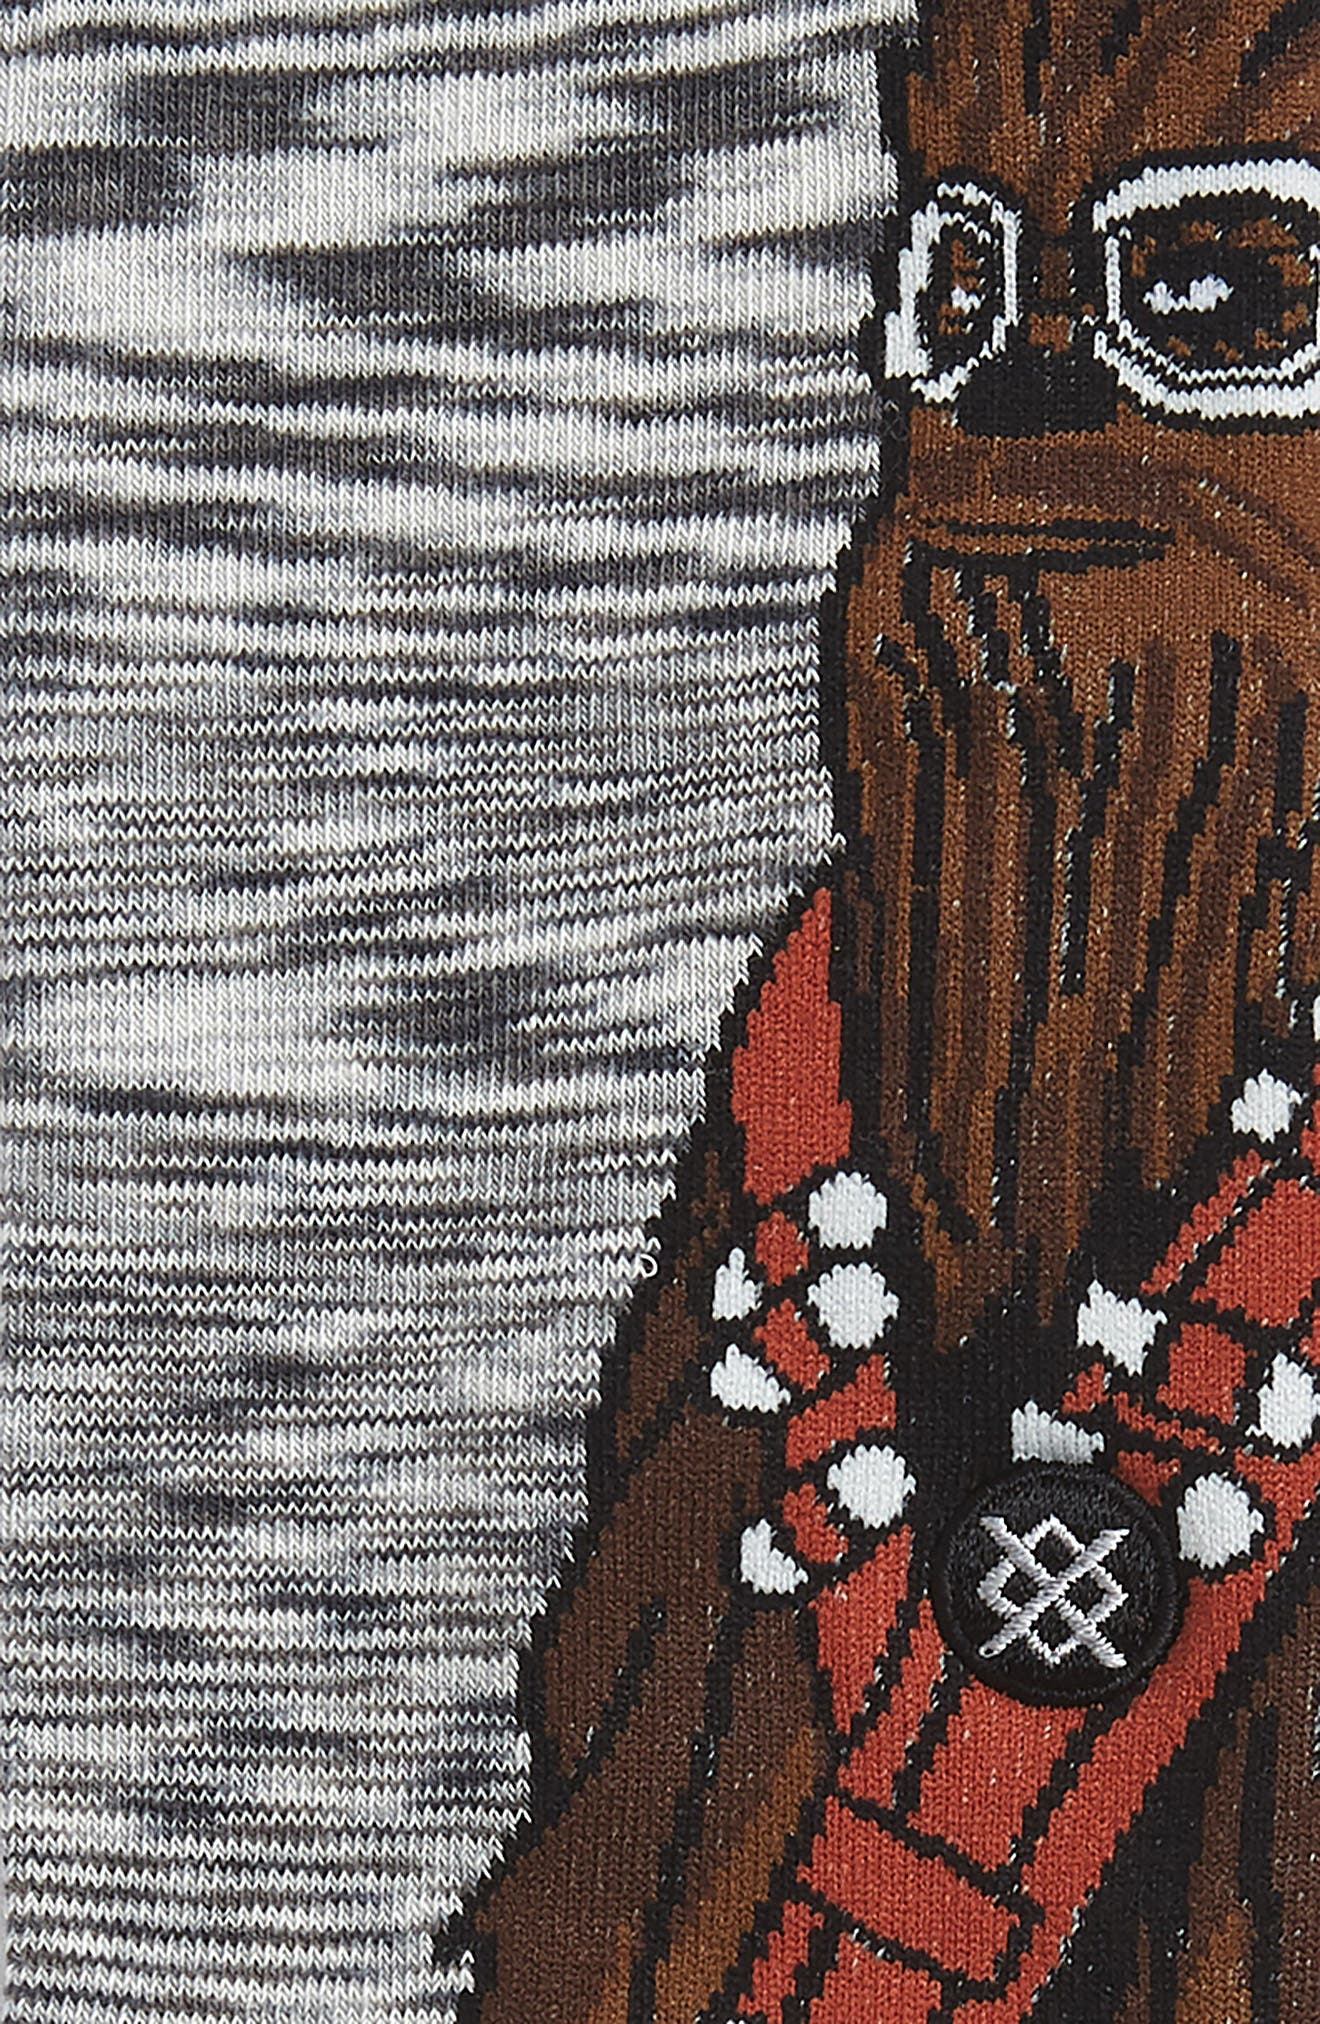 Star Wars Kessel Run Socks,                             Alternate thumbnail 3, color,                             GREY